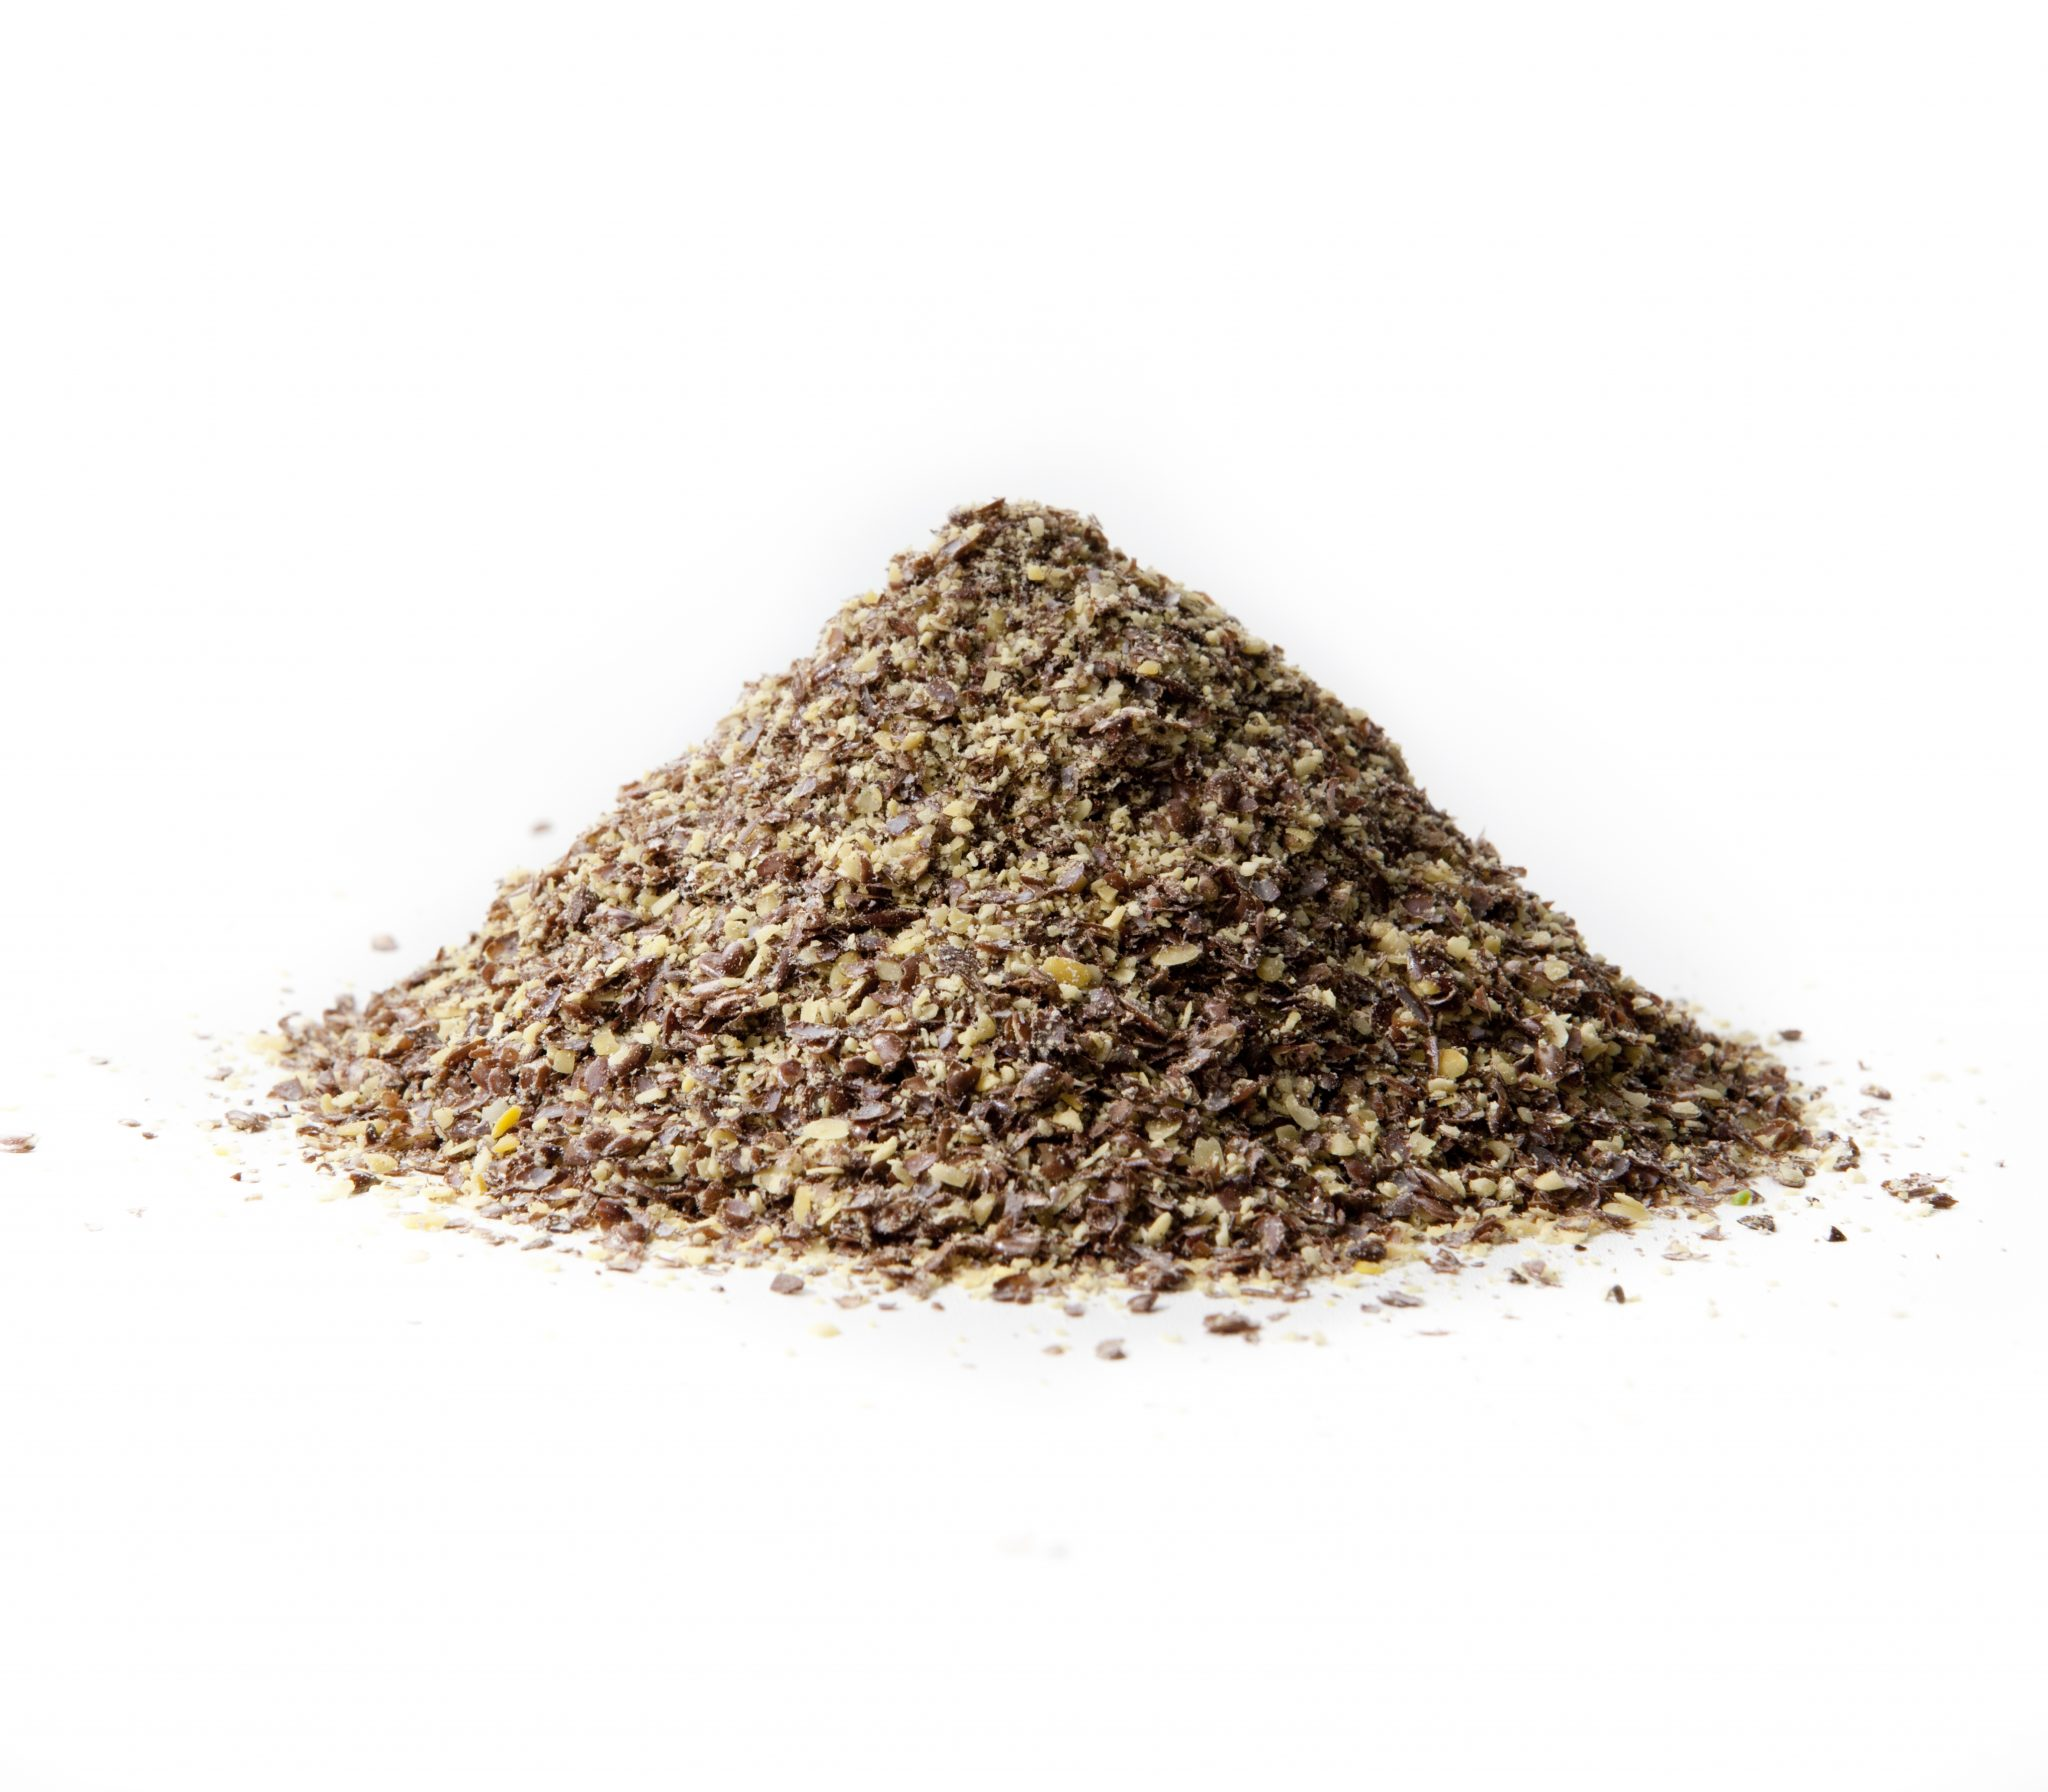 Paahdettu rouhittu pellava (Pellavarouhe), 300 g